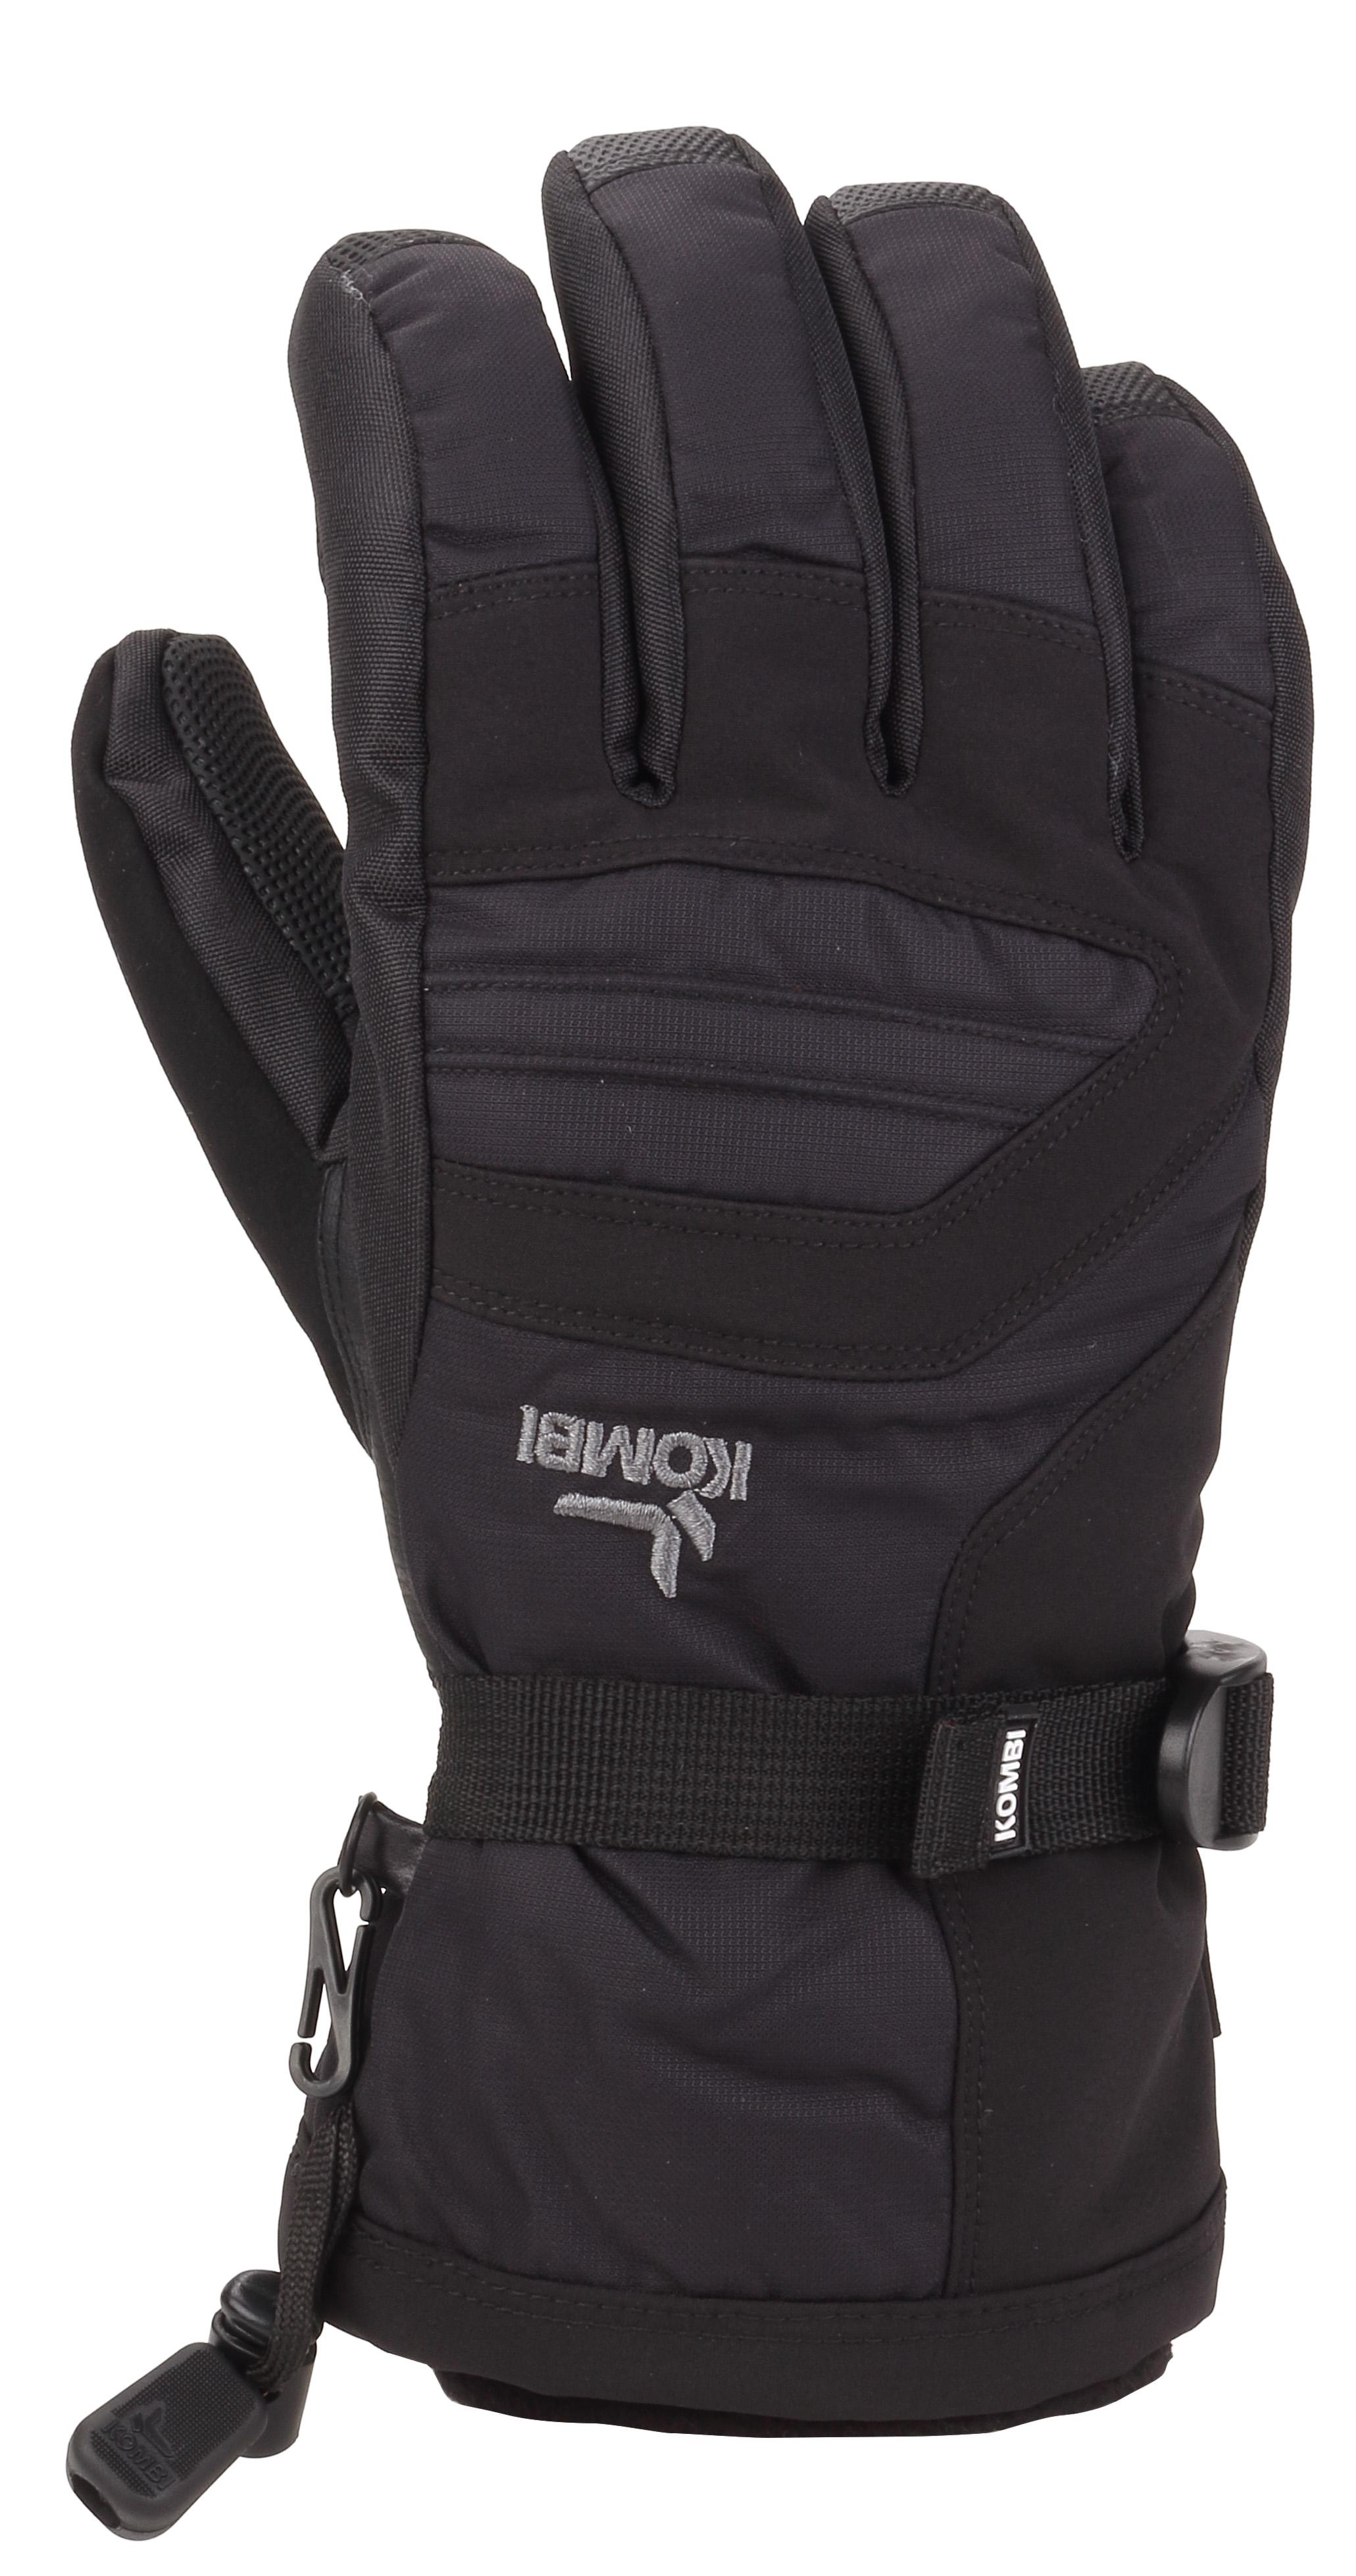 Women's Storm Cuff III Ski Gloves, Black/Black, swatch